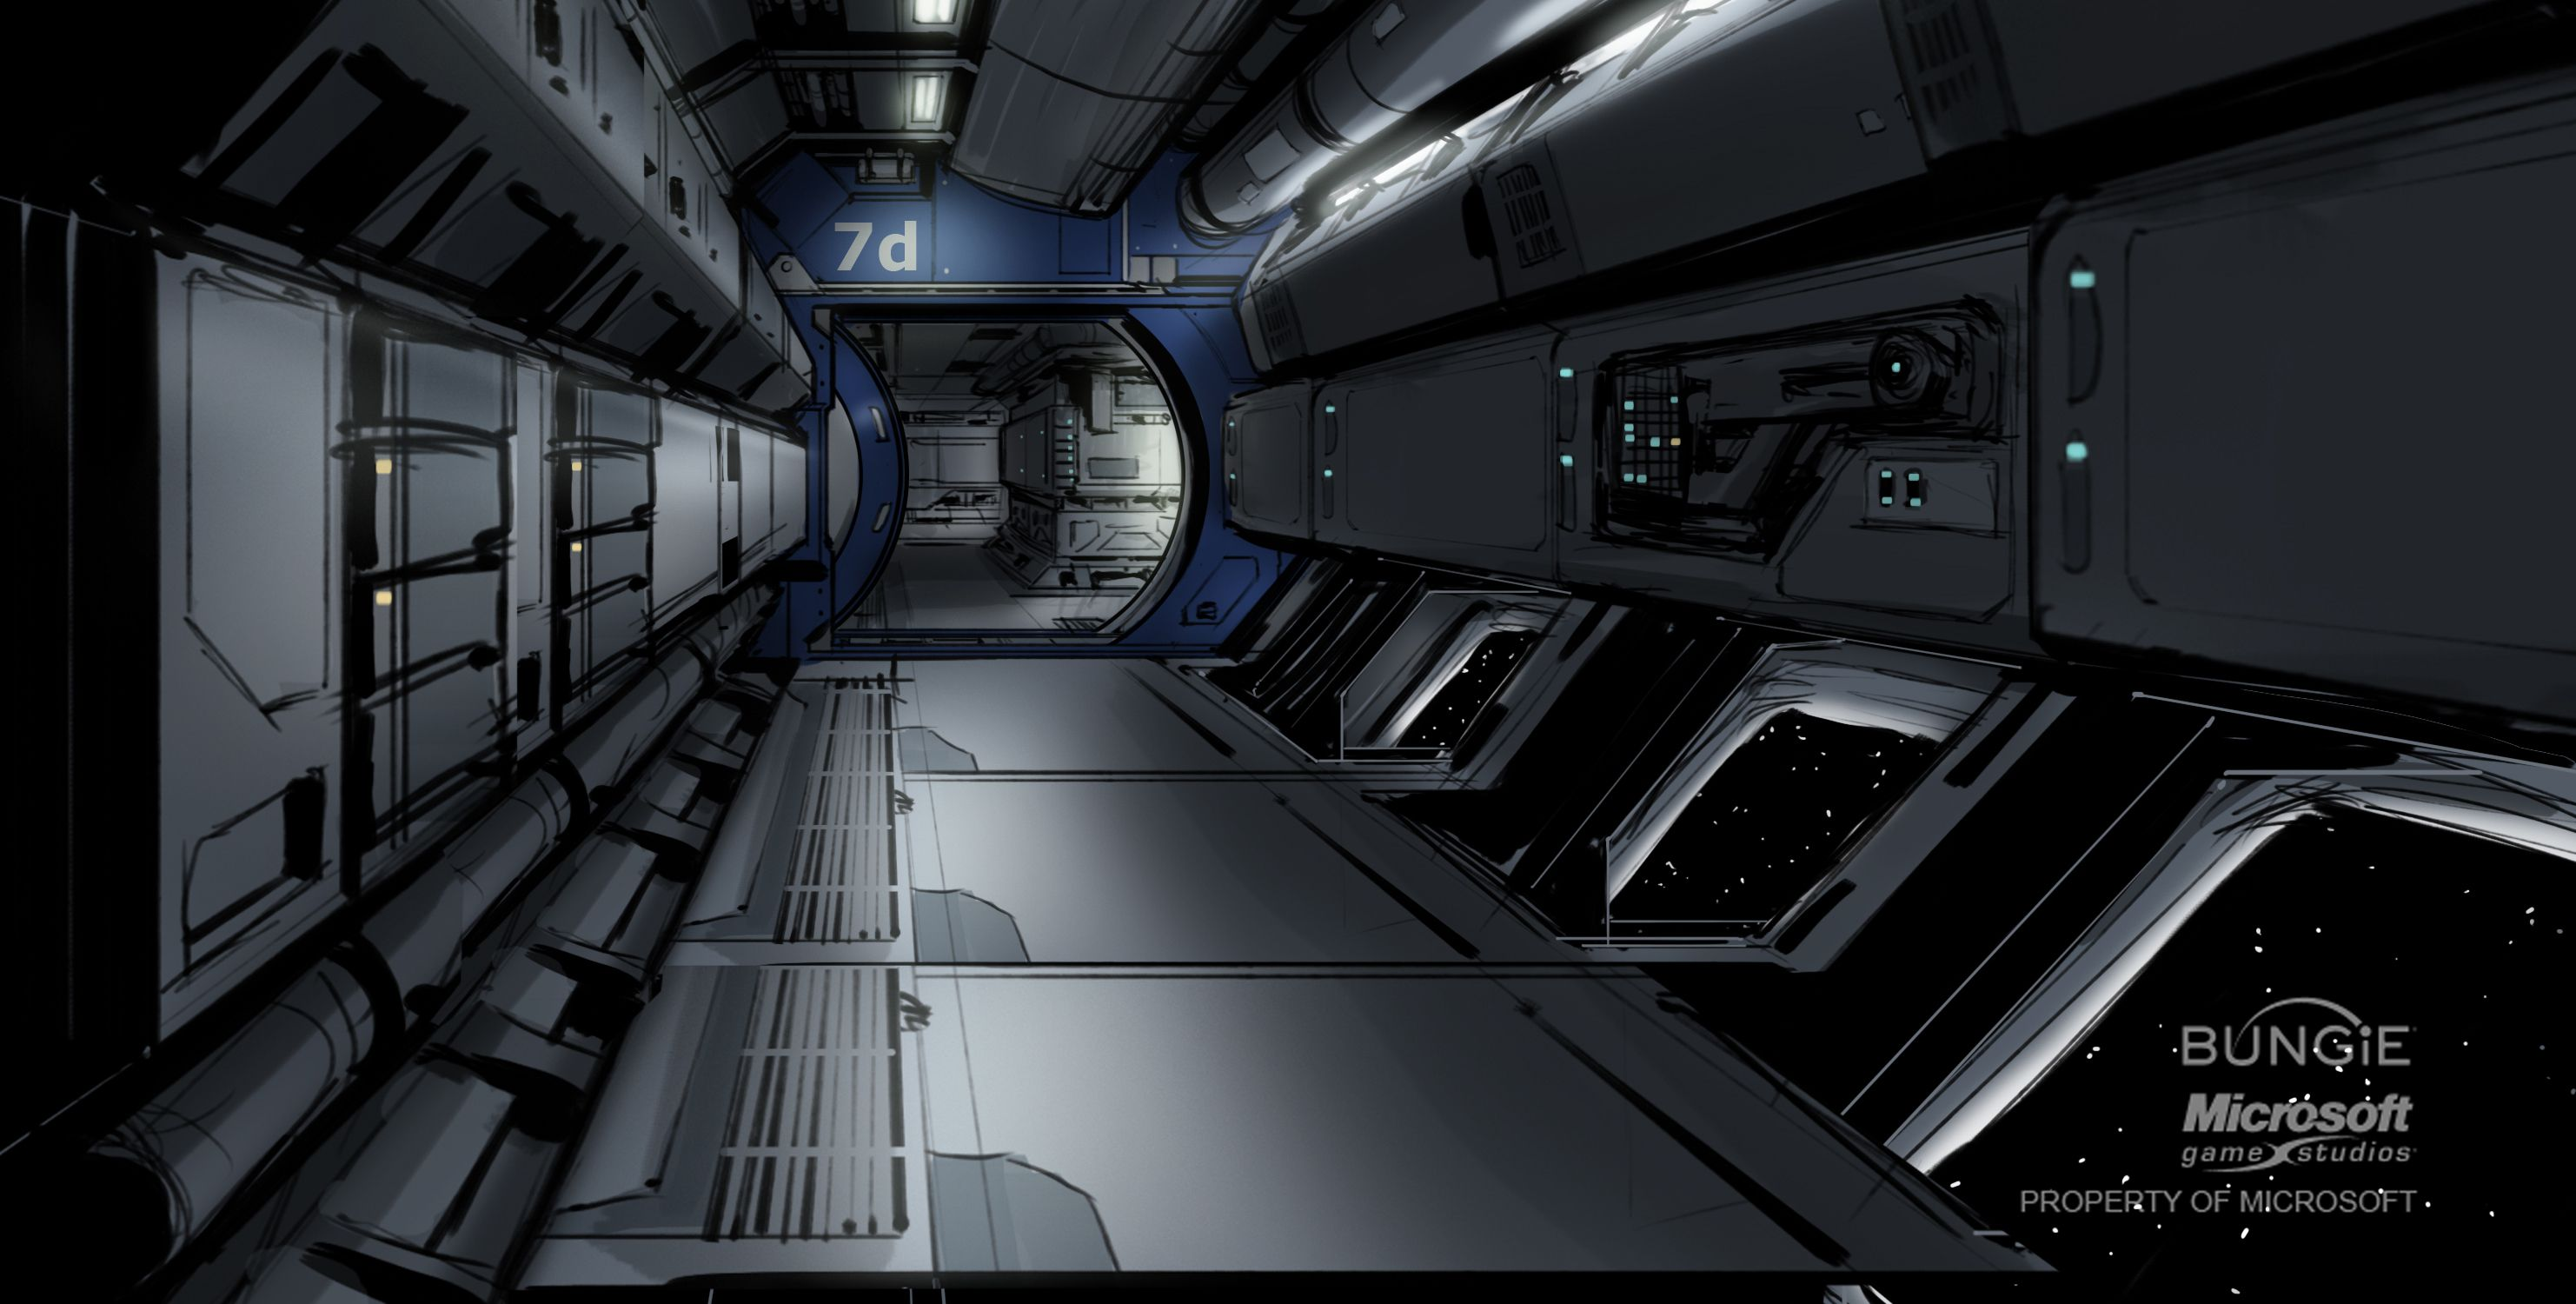 space station interior - Google Search | Sci fi ...